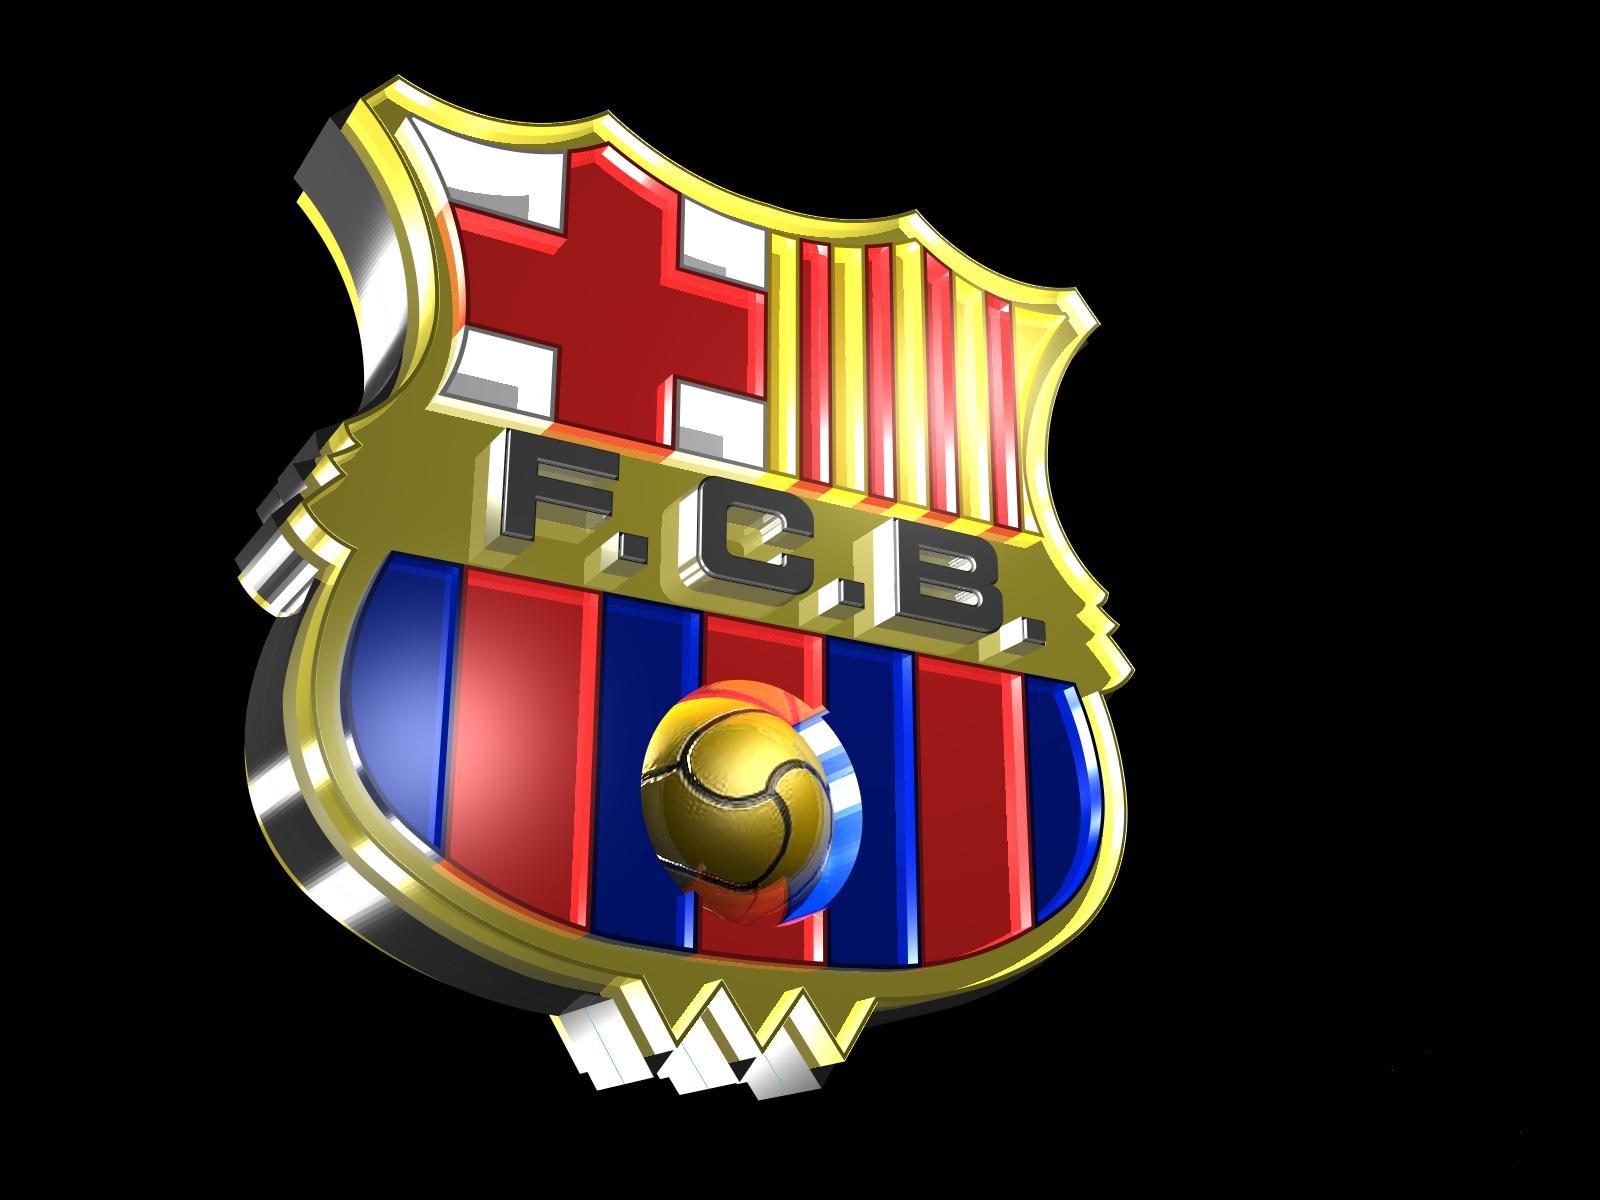 Images fc barcelona logo - john doan harp guitar image